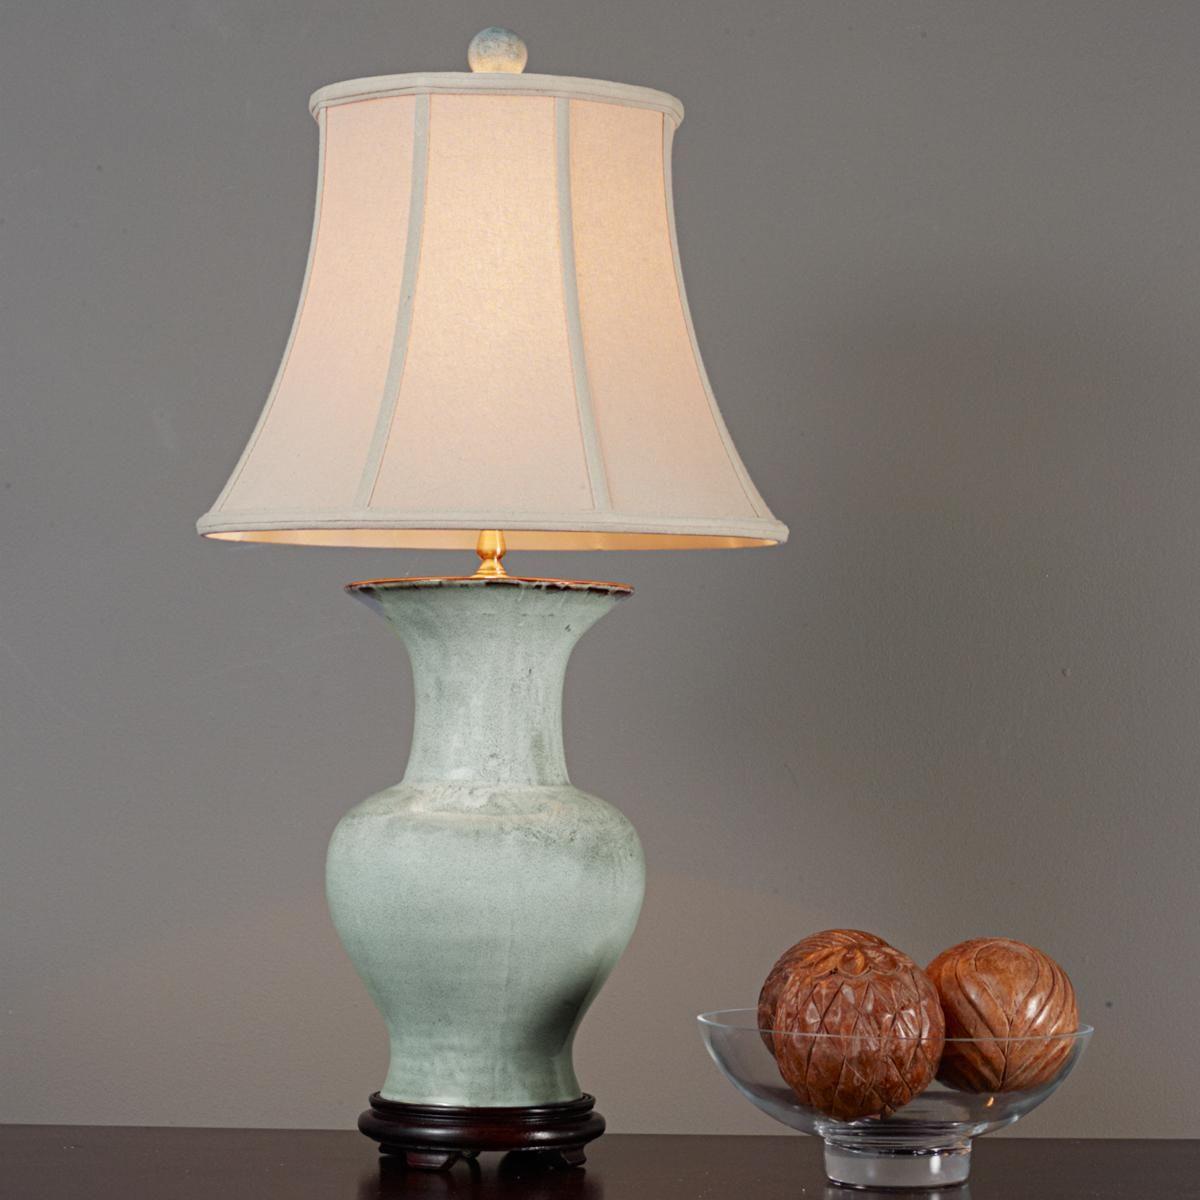 Ginger Jar Porcelain Table Lamp | For the Home | Pinterest ...